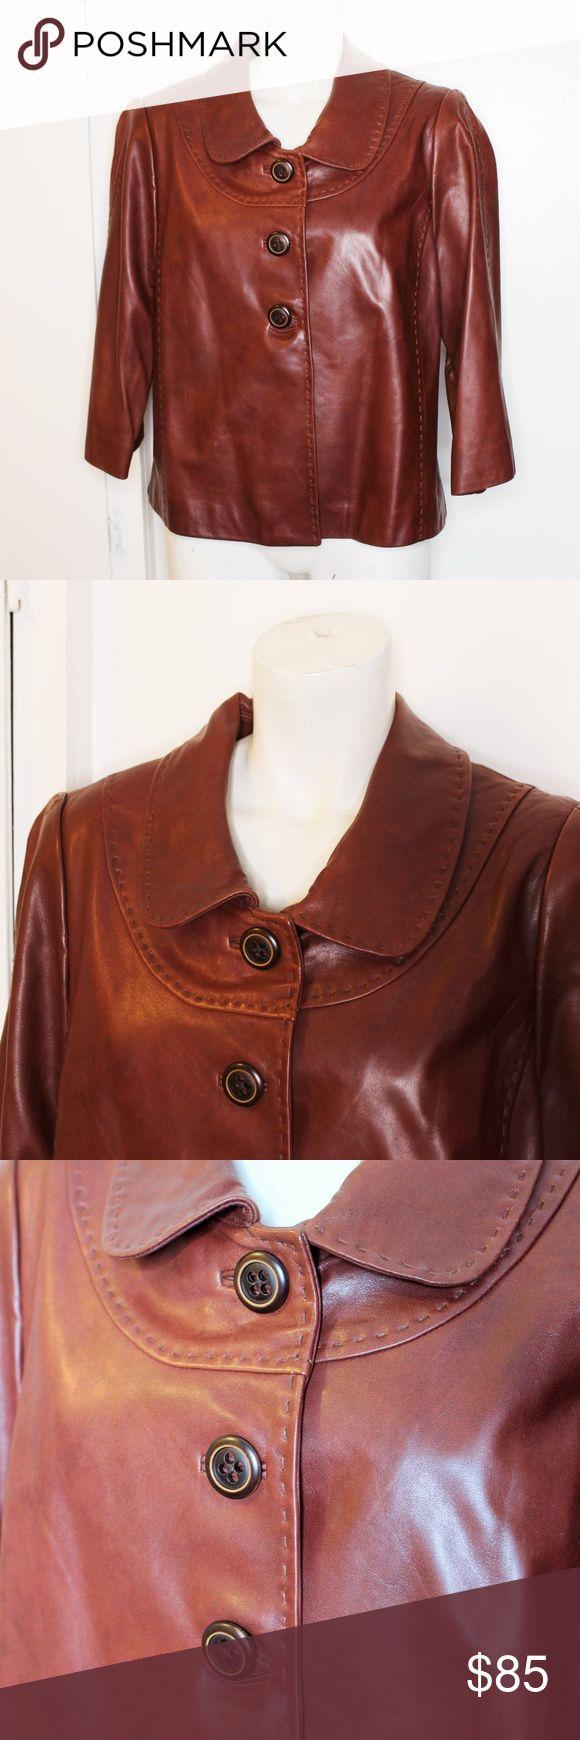 Nordstrom Classiques Entier Brown Leather Jacket L Brown